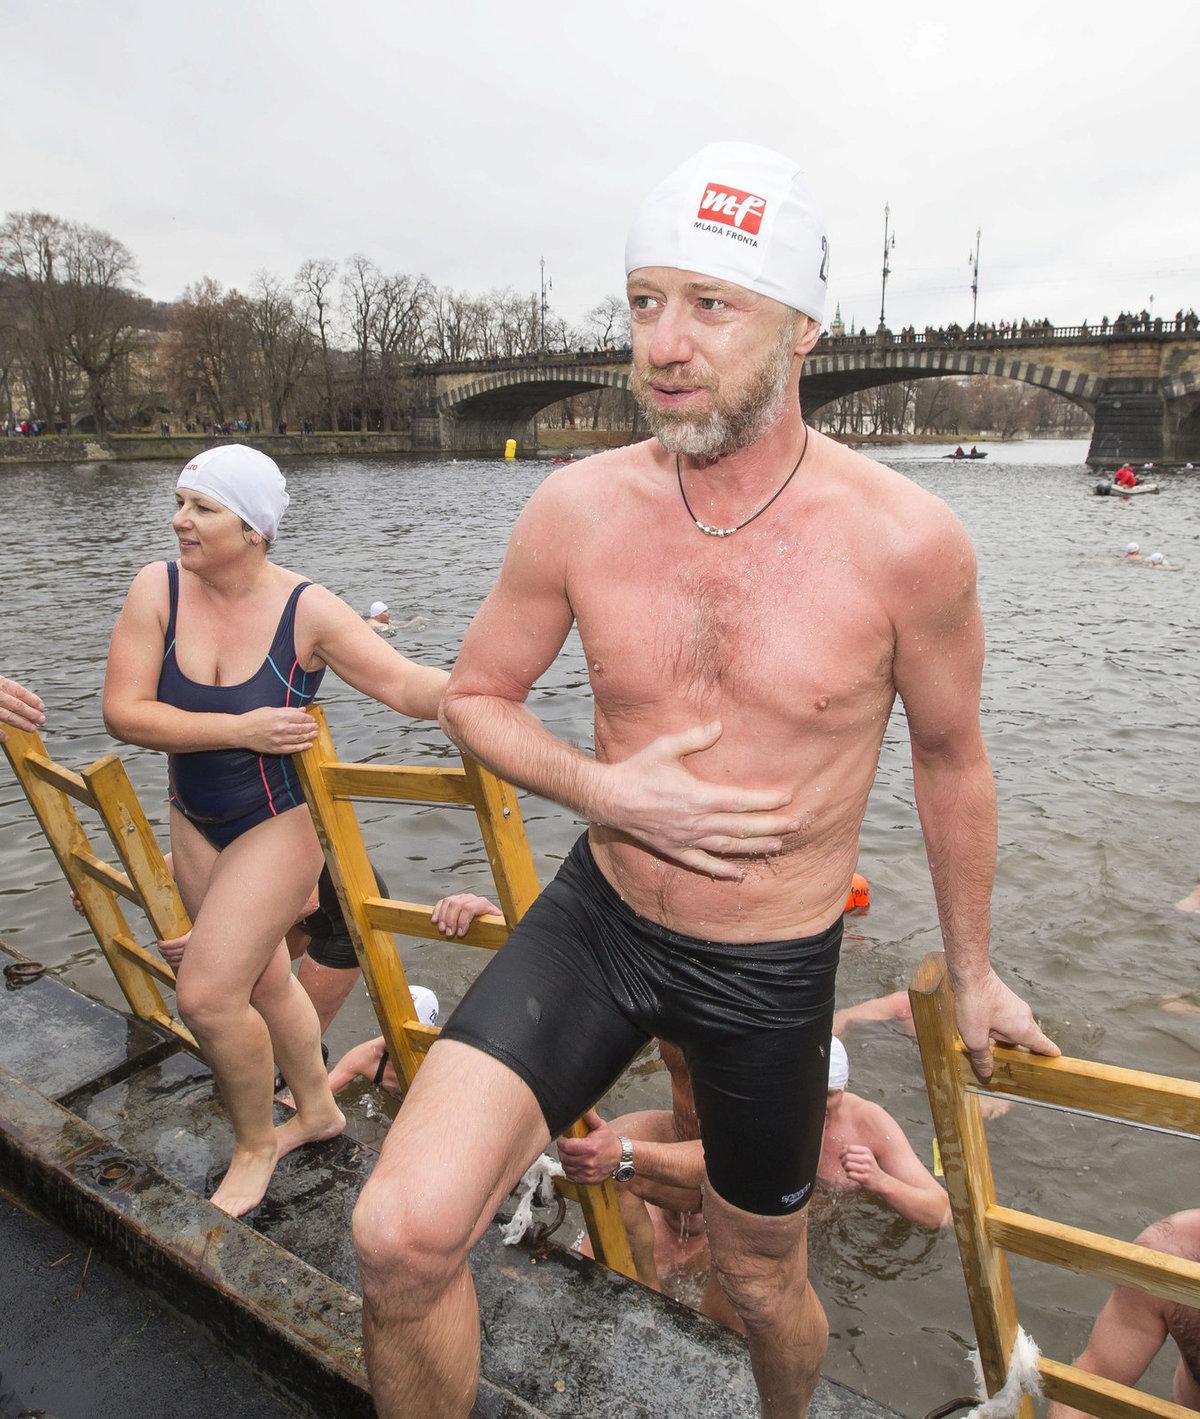 Když doplaval, netajil se radostí, že to má už za sebou.